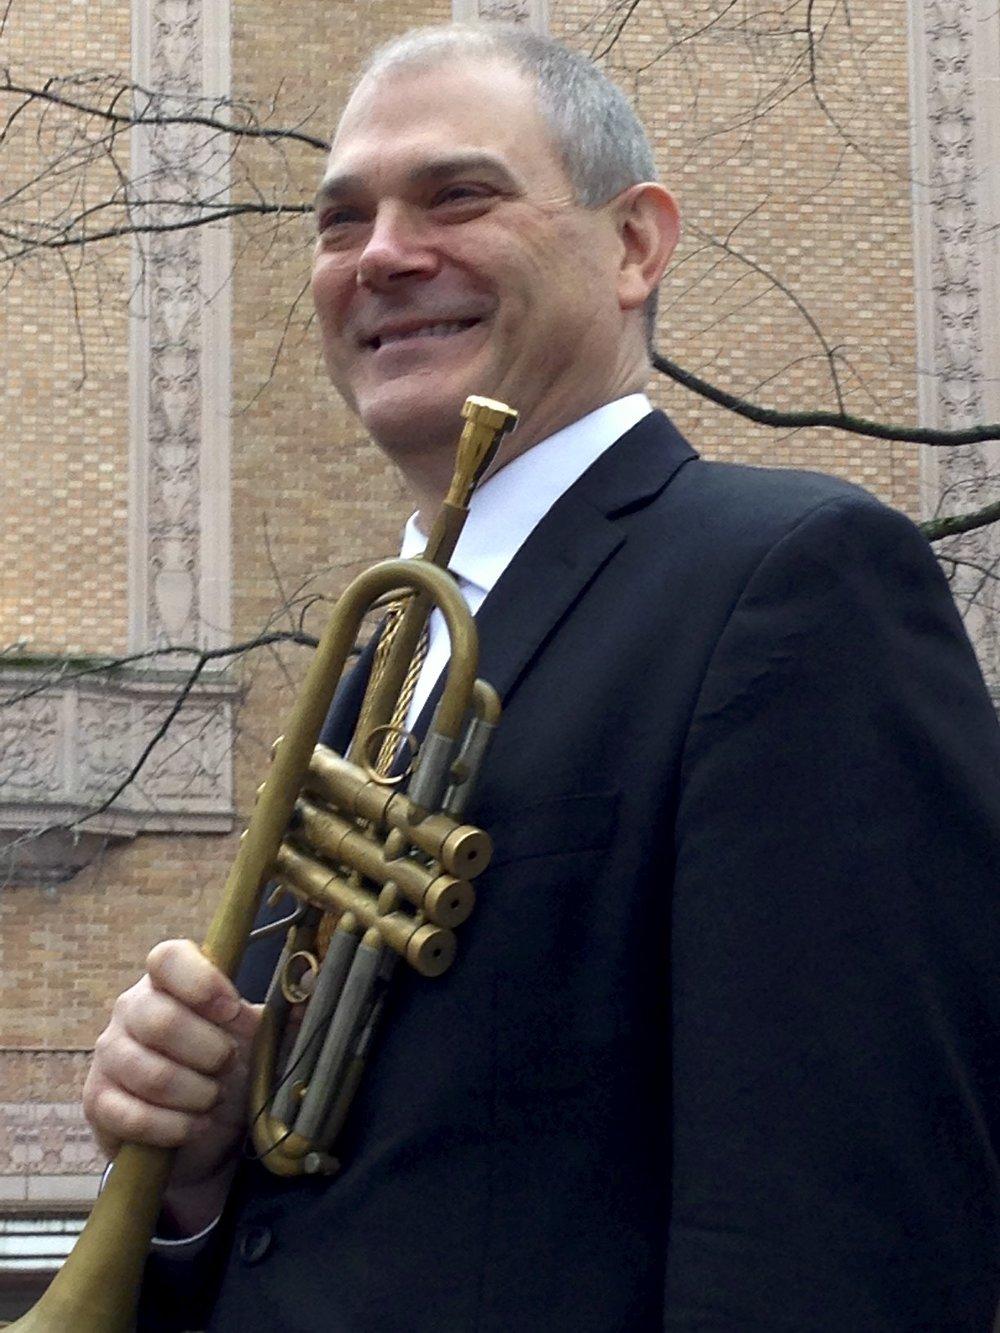 Steve Conrow, trumpet - Regular Substitute Trumpet, Oregon Symphony Orchestra. Performer, Eugene Symphony, Oregon Ballet TheaterLearn more about Steve ➝